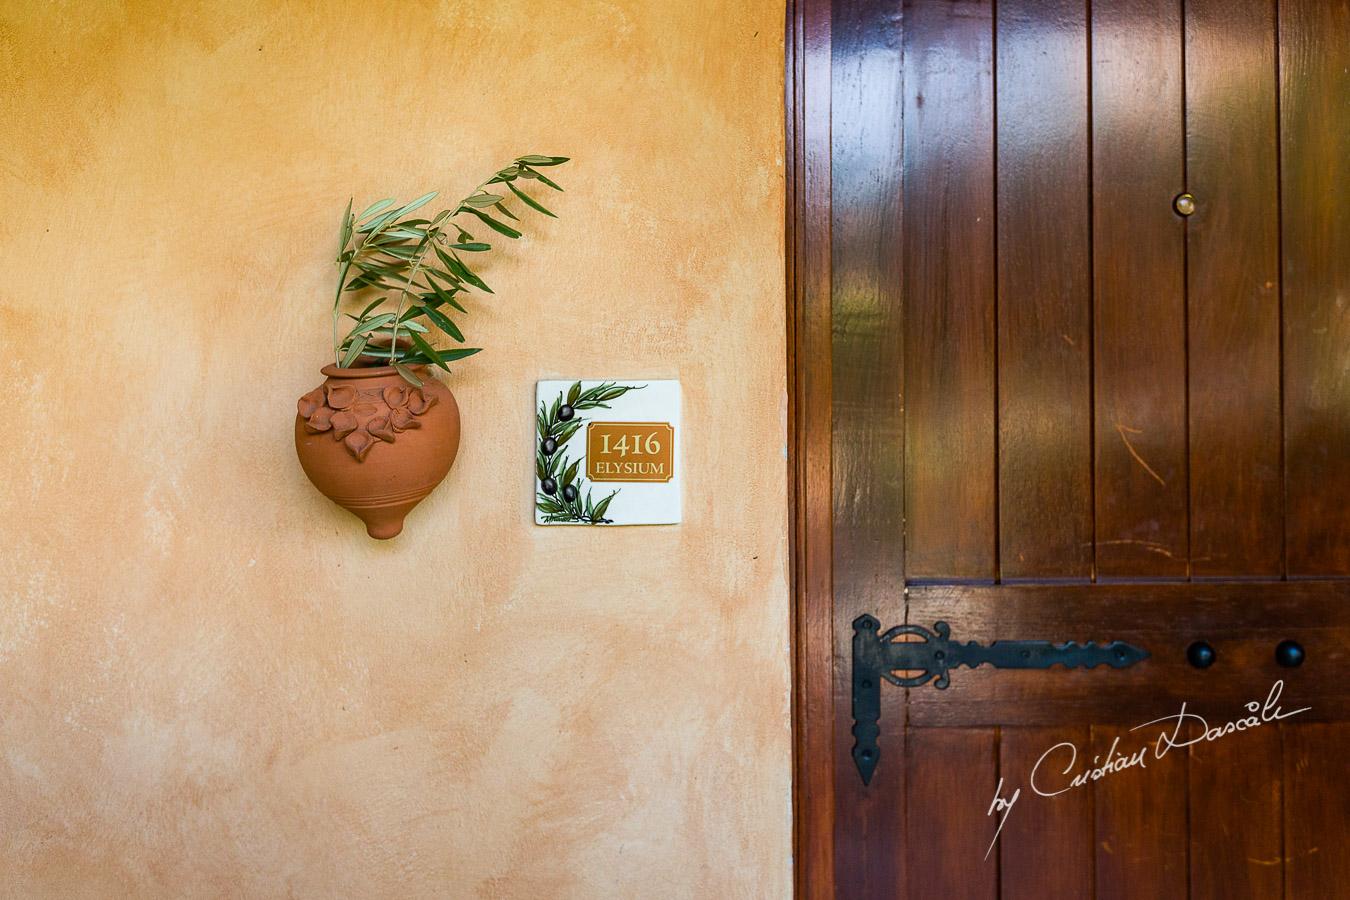 Groom's Room at the Elysium Hotel in Paphos.